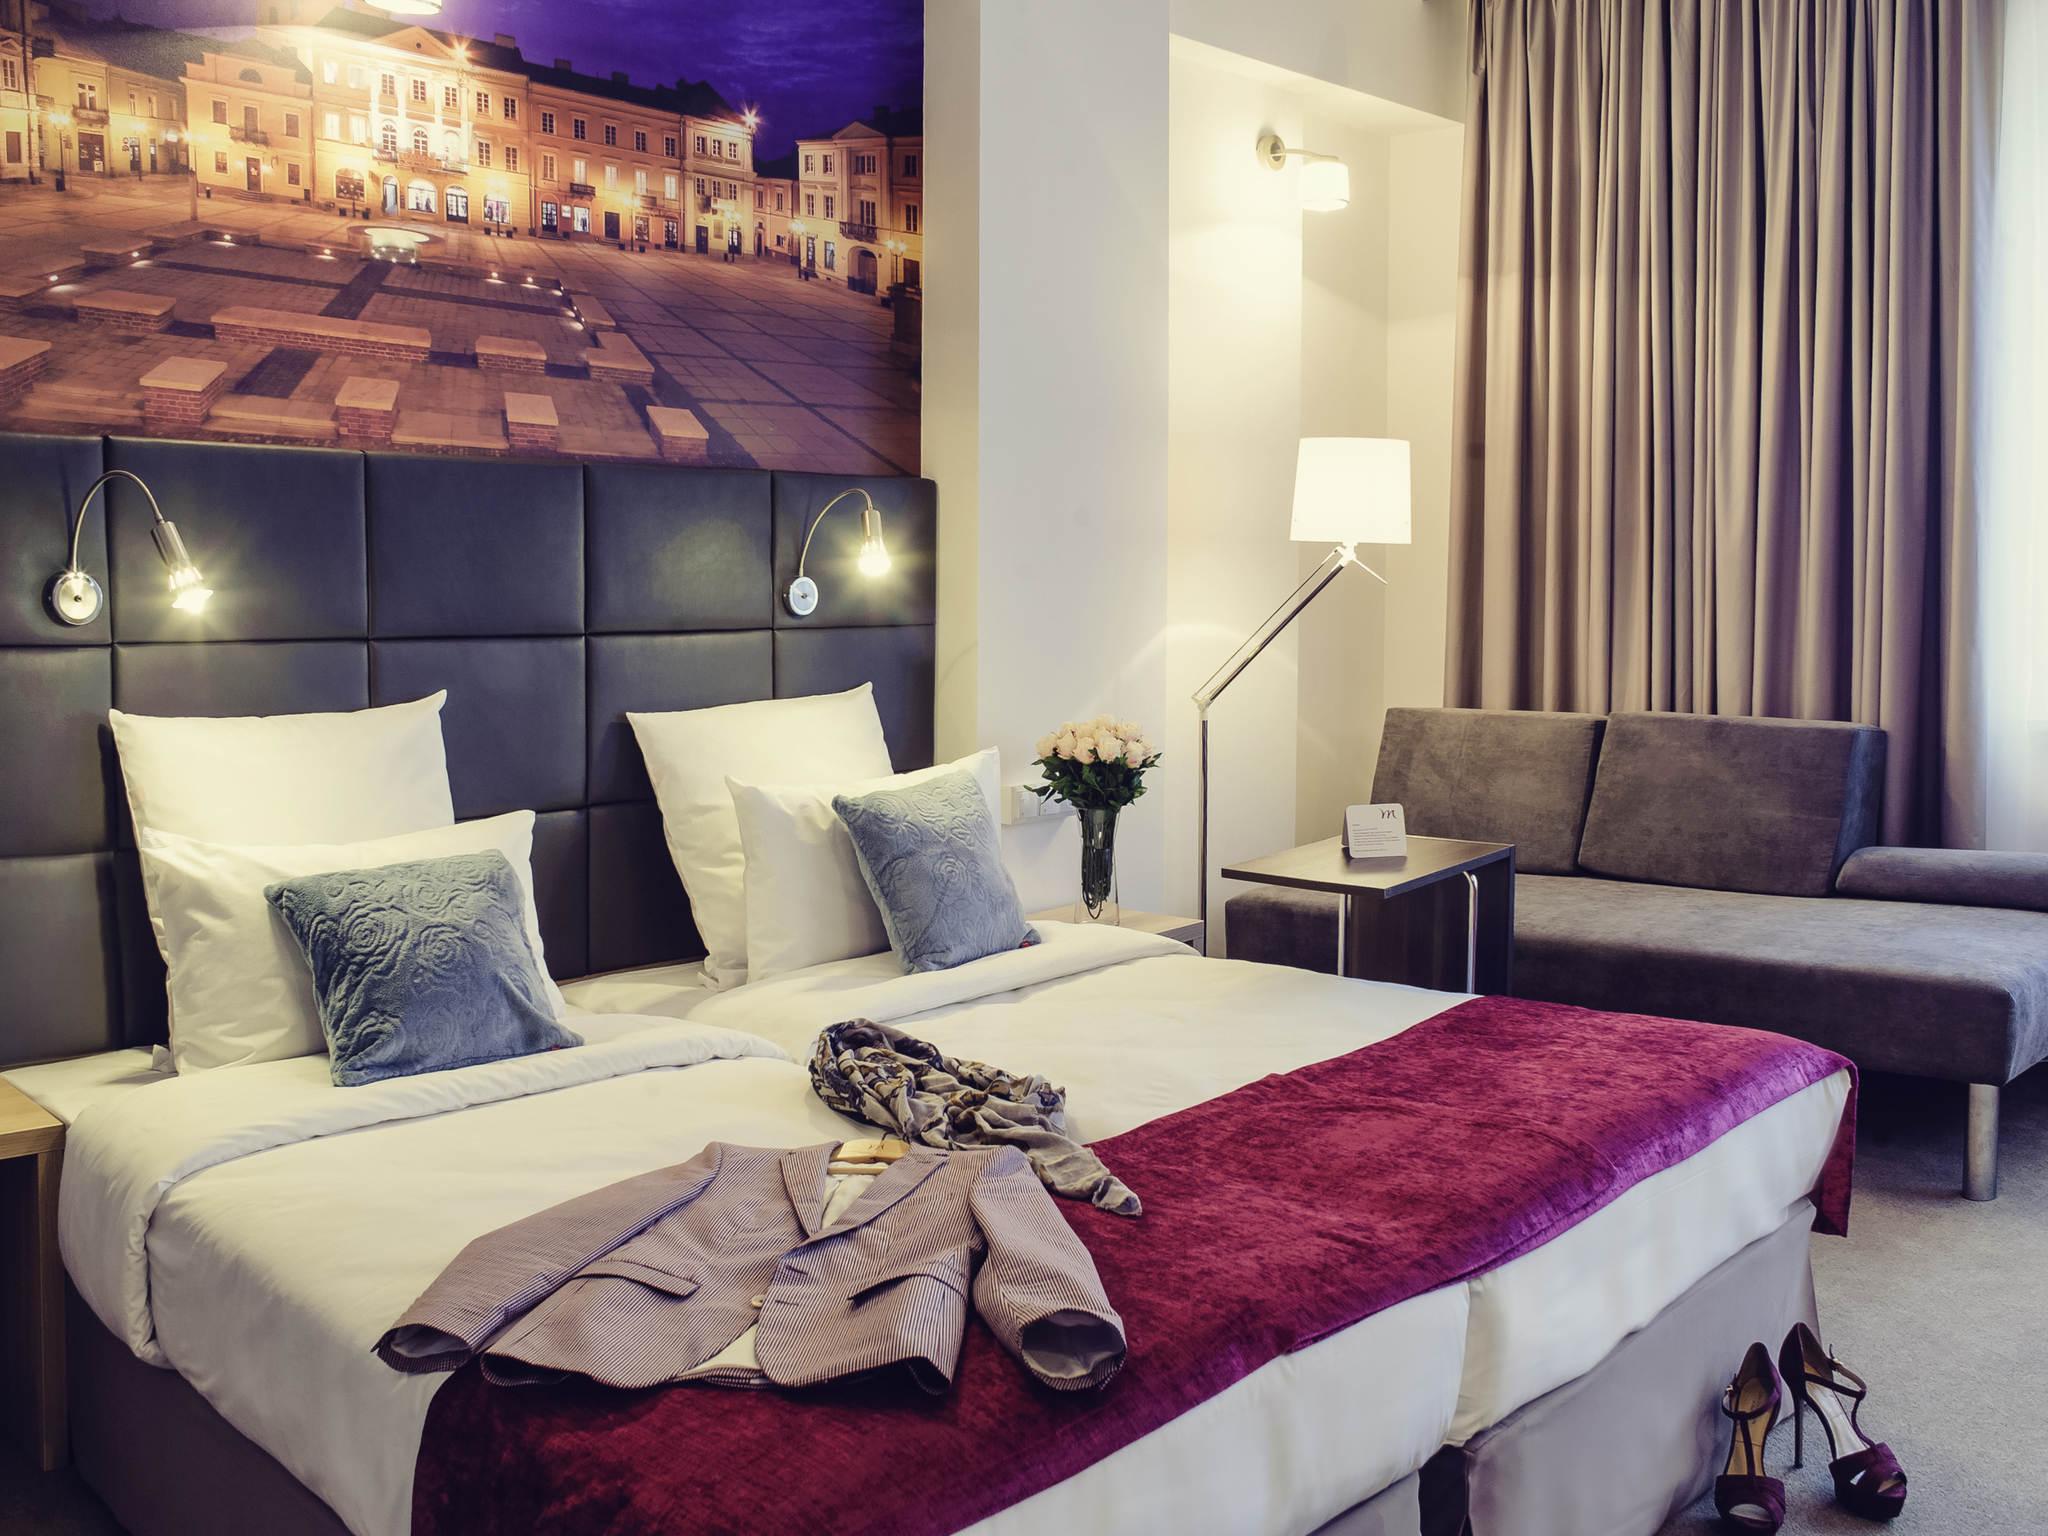 Hotel - Hotel Mercure Piotrkow Trybunalski Vestil